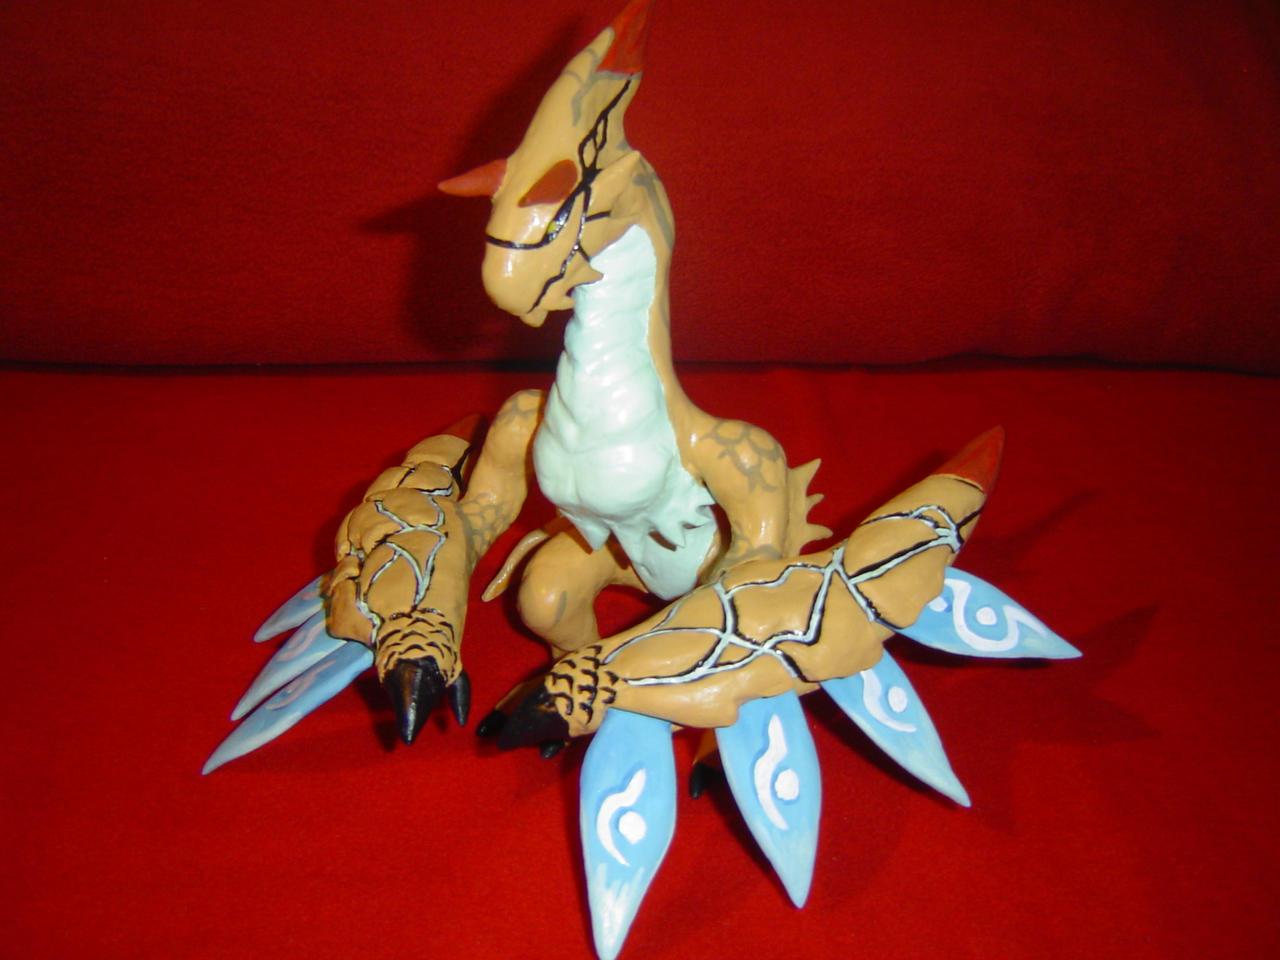 Kaiser Dragon Modelling Clay By RedDragonTyr On DeviantArt